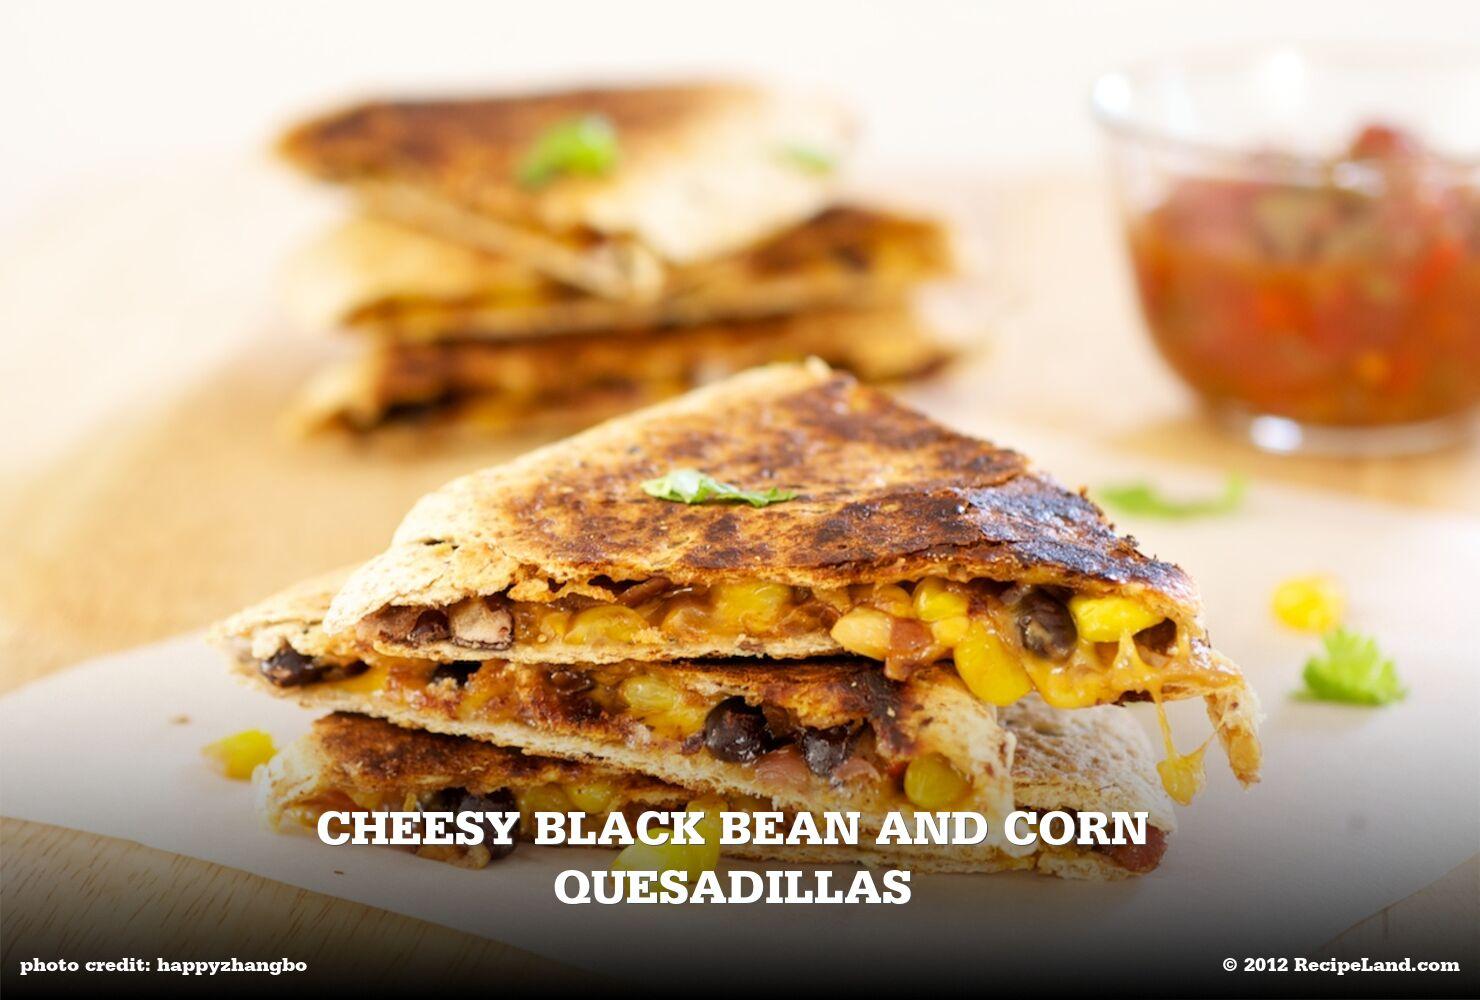 Cheesy Black Bean and Corn Quesadillas